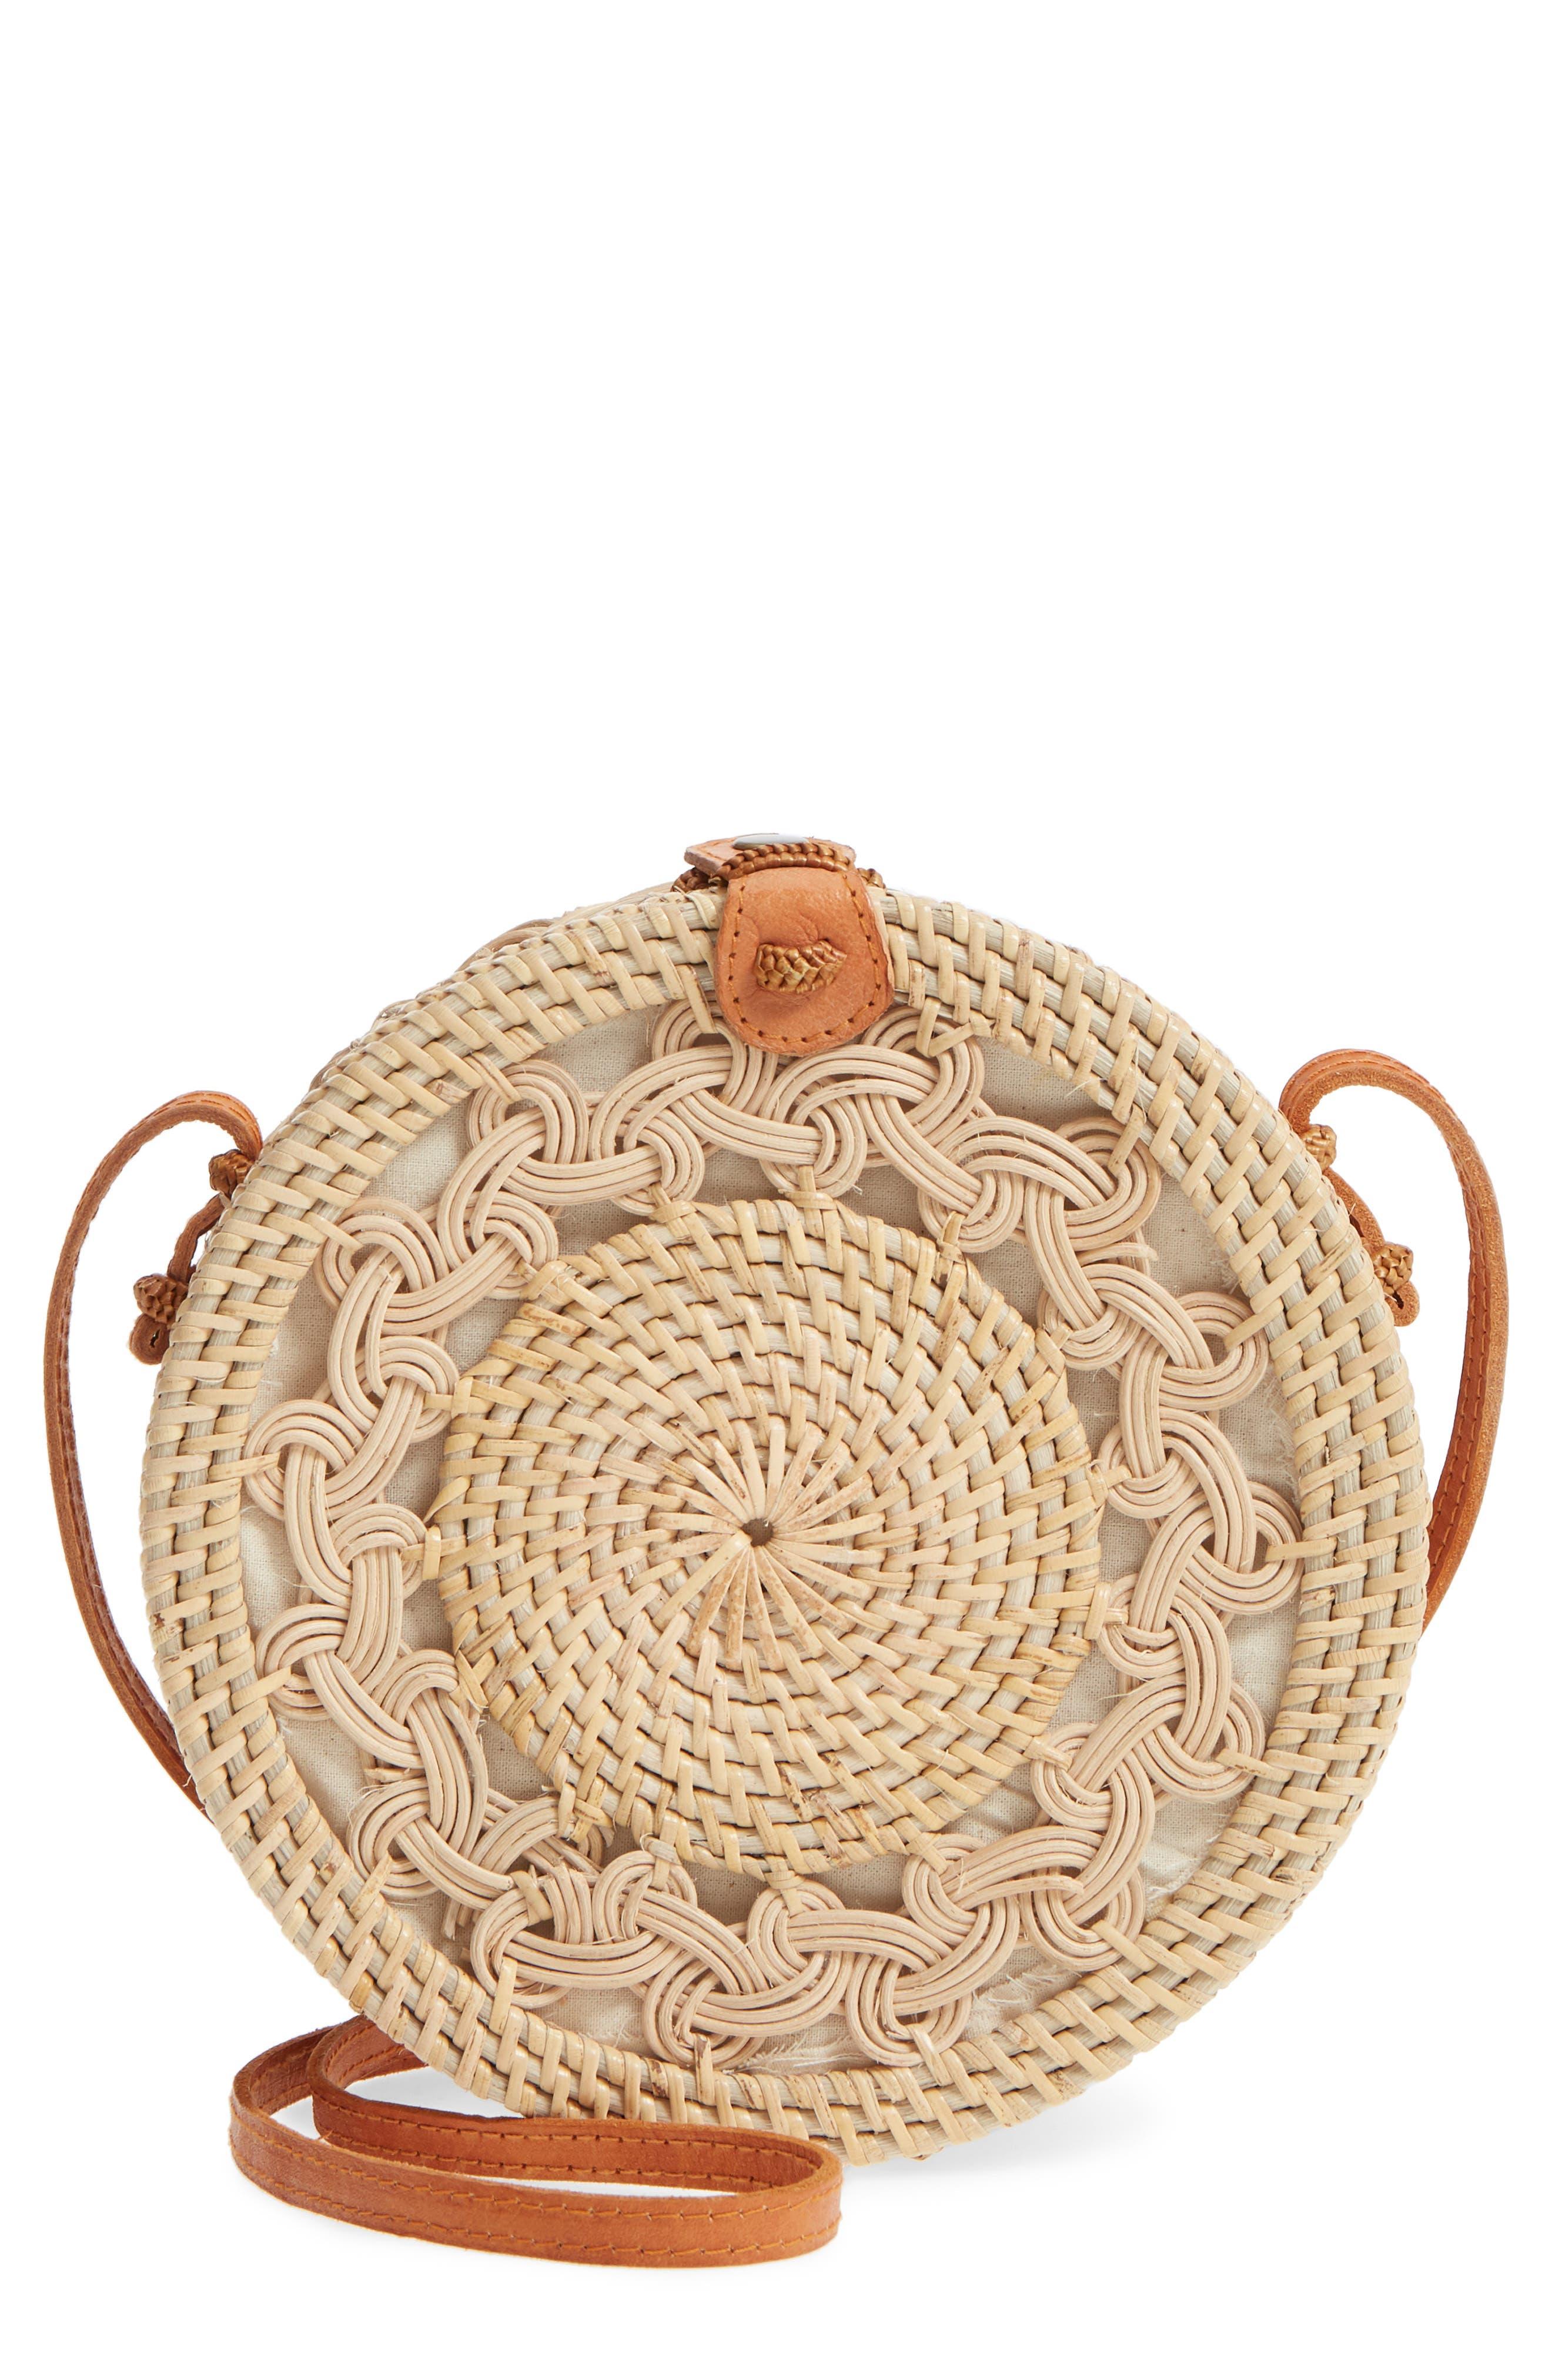 Woven Rattan Circle Crossbody Bag,                             Main thumbnail 1, color,                             Lighter Tan/ Natural